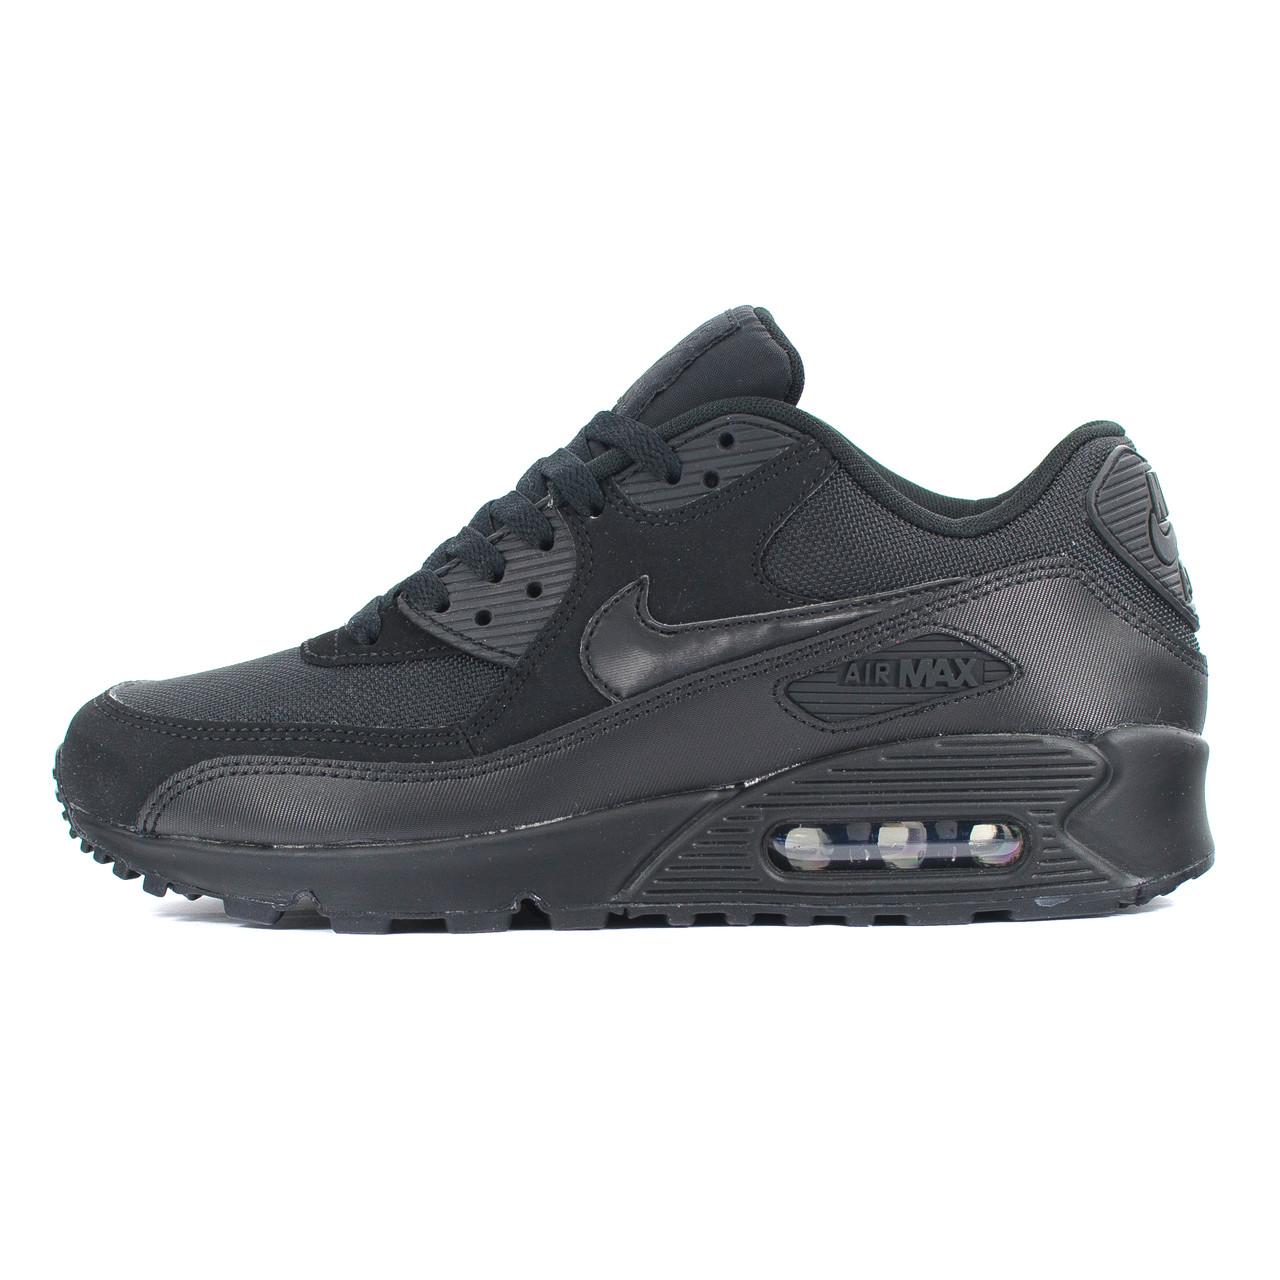 Мужские кроссовки NIKE AIR MAX 90 ESSENTIAL (Артикул  537384-090) - Интернет 4cca1aa1b96